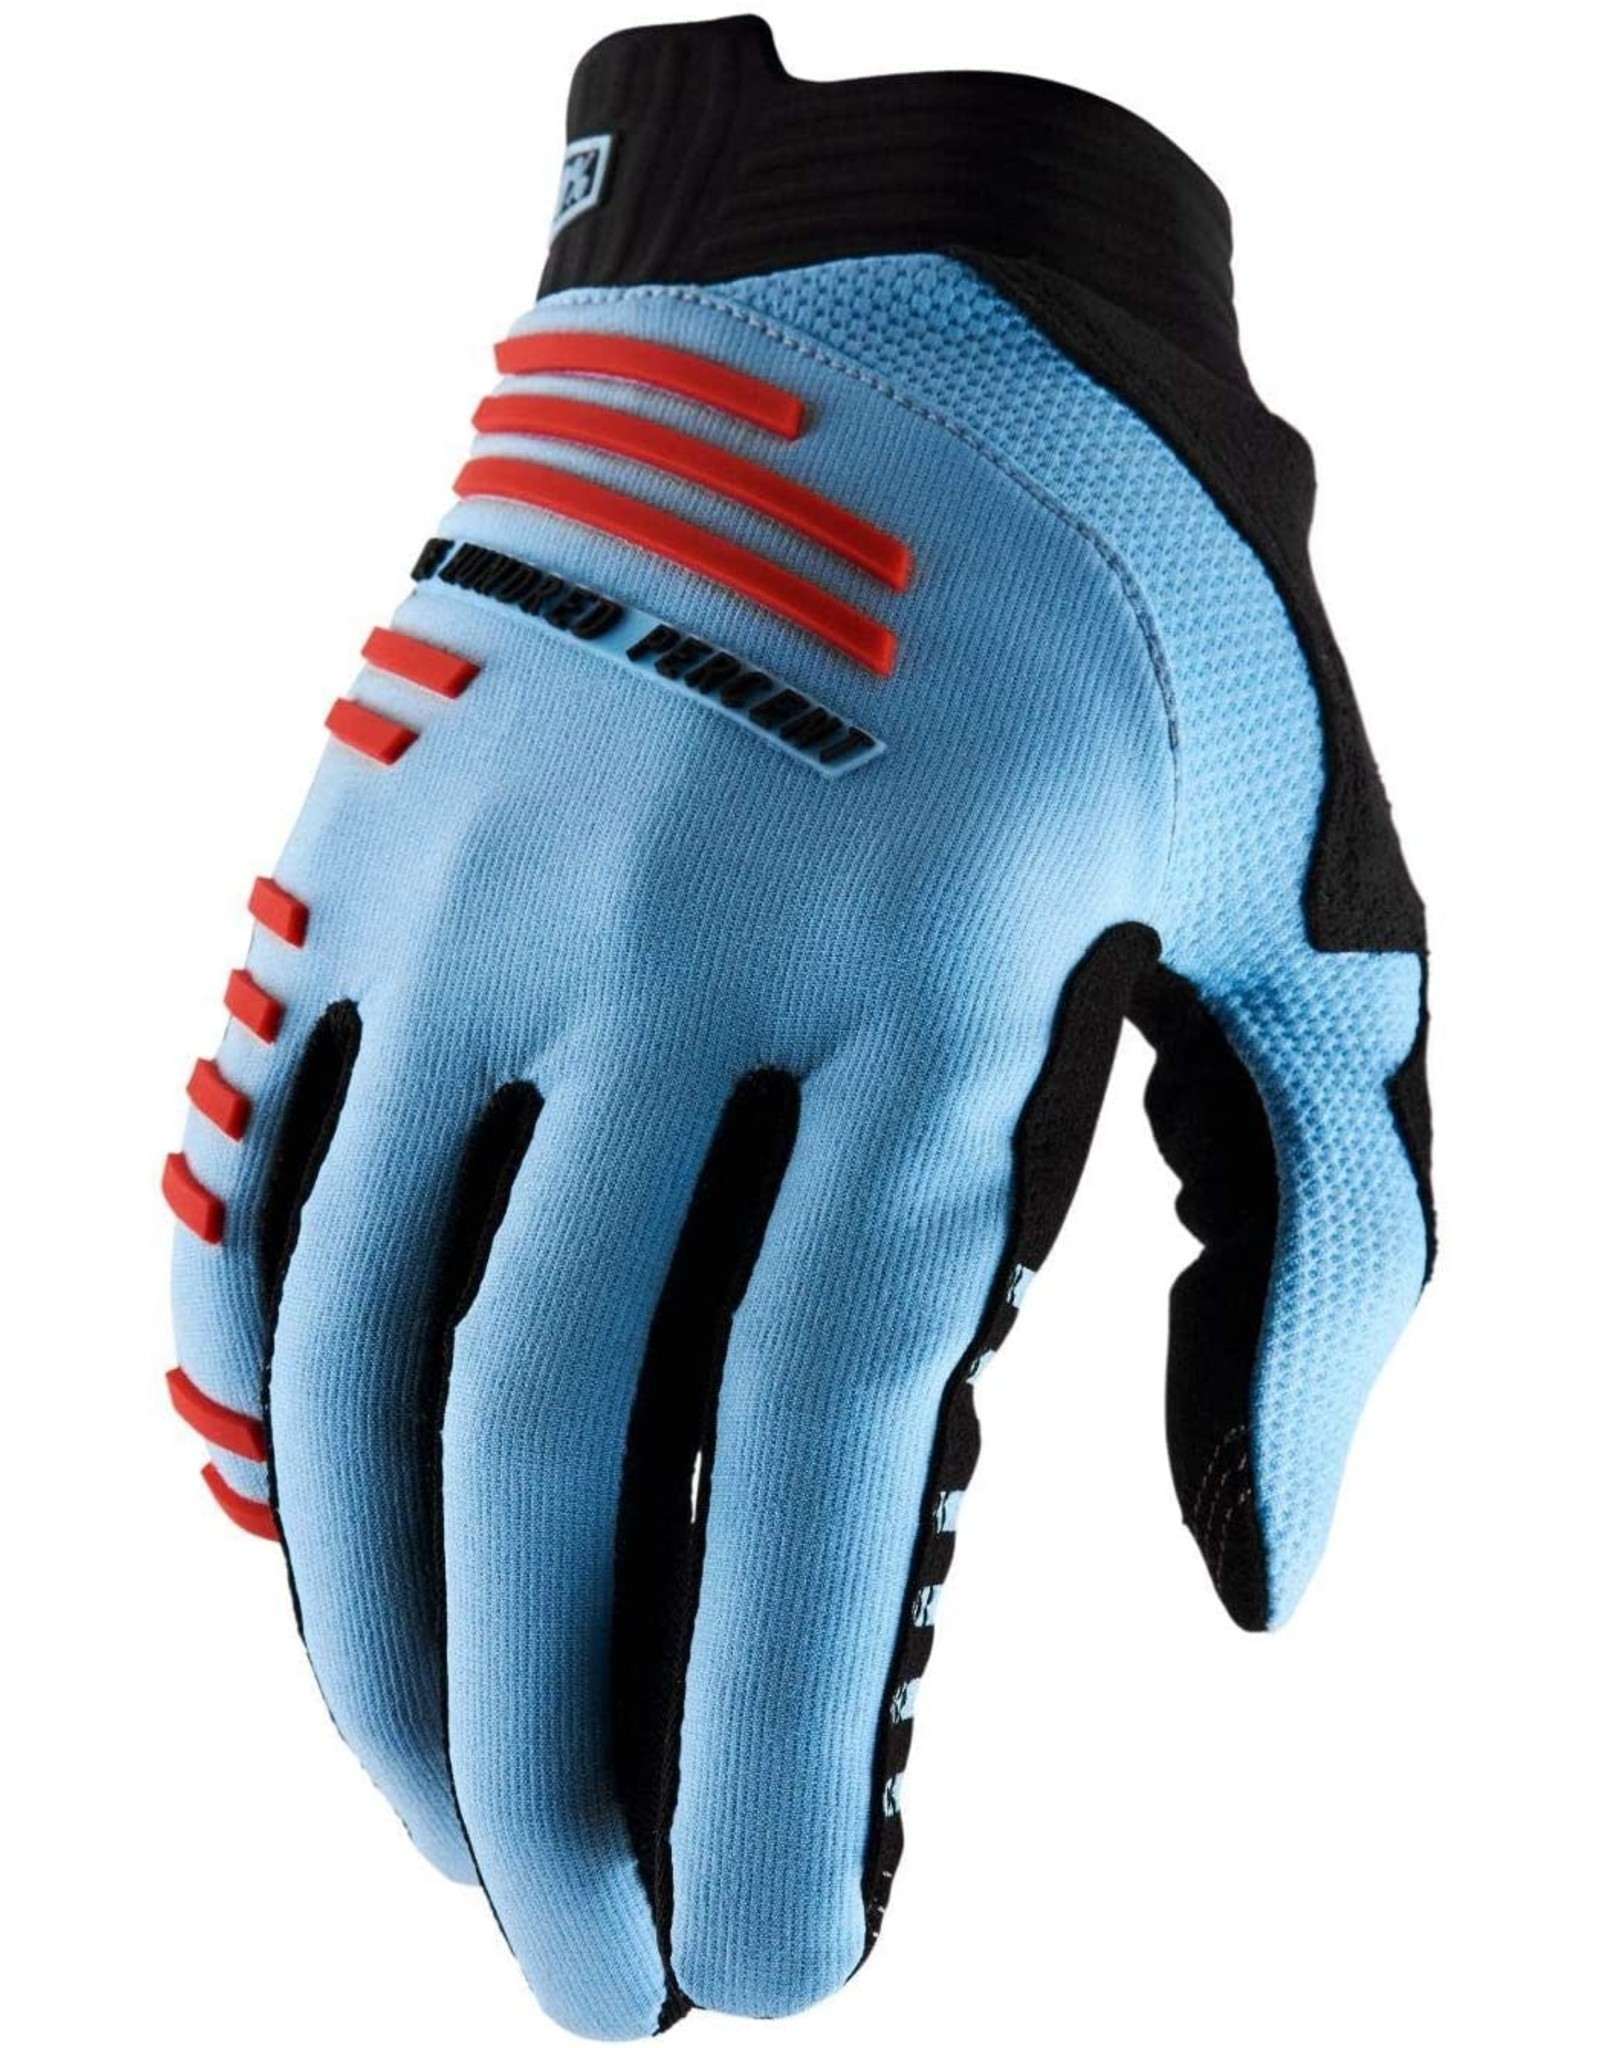 100% 100 % - R-CORE Gloves Light Blue/Red XL